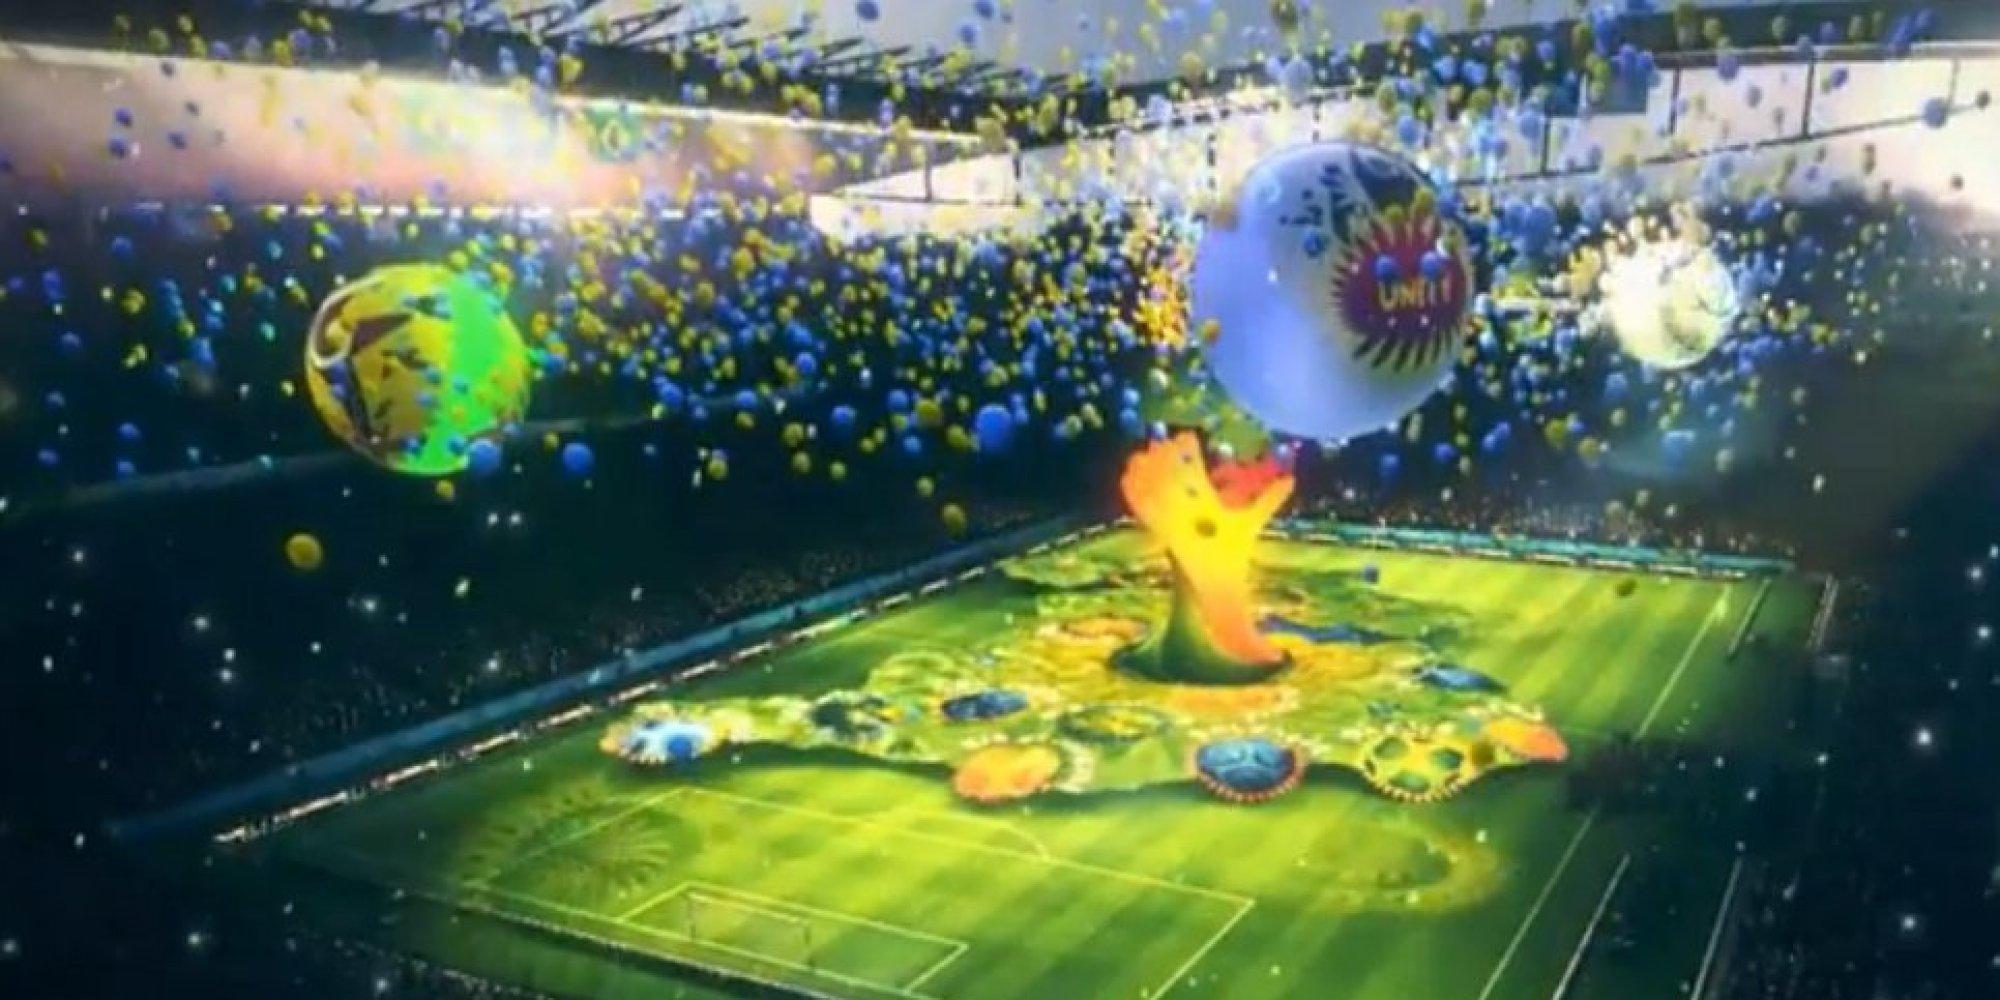 FIFA-2014-WORLD-CUP-GAMPLAY-facebook jpgFifa 2014 World Cup Gameplay